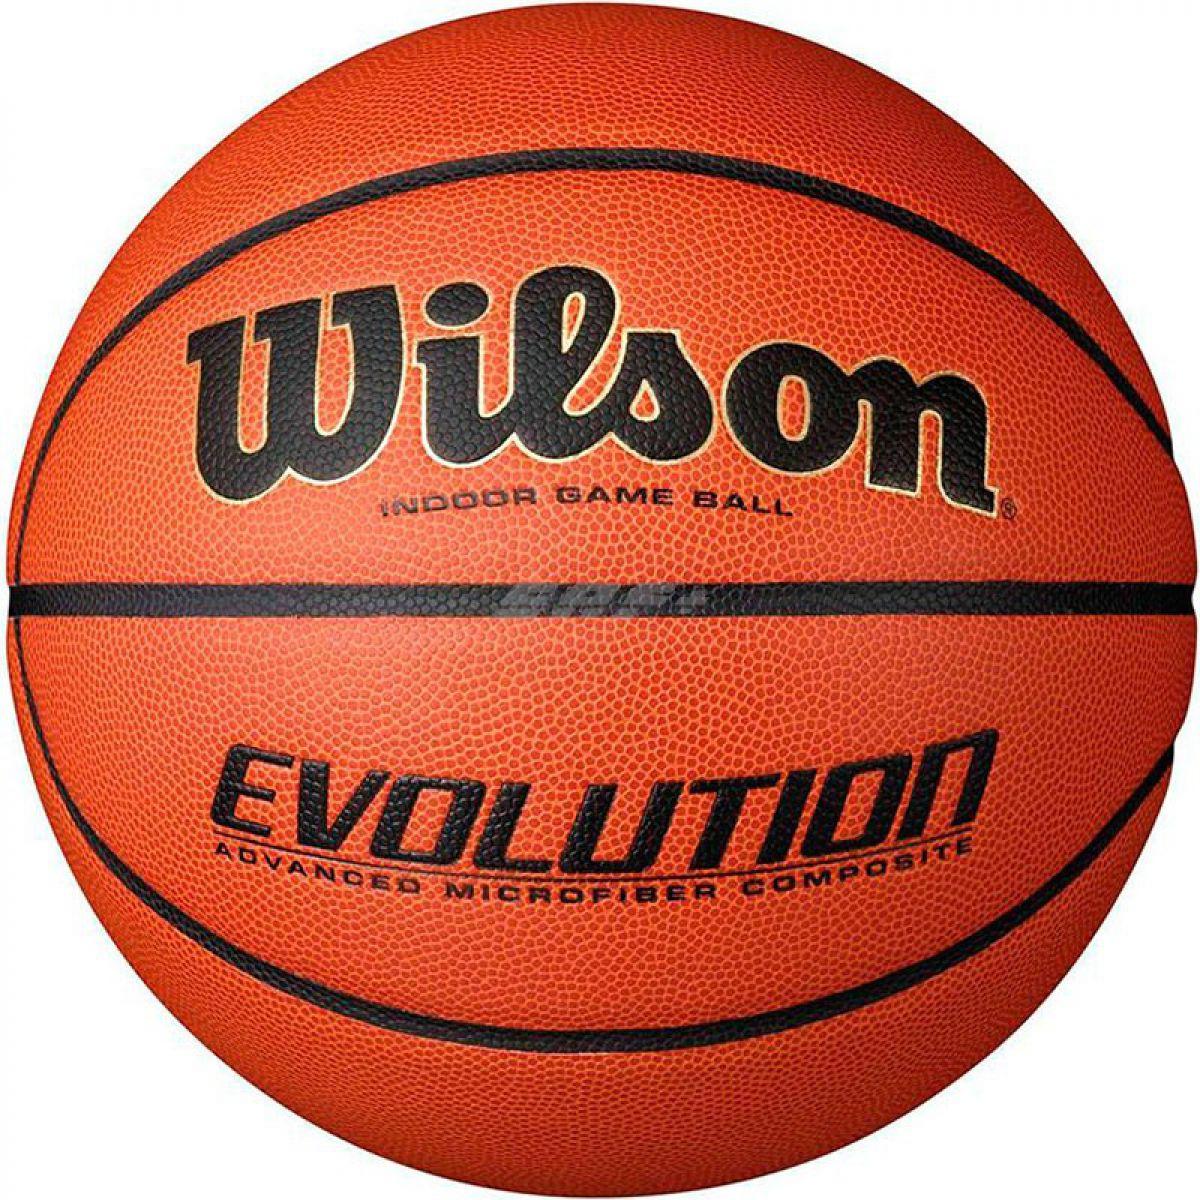 Мяч баскетбольный WILSON Evolution England